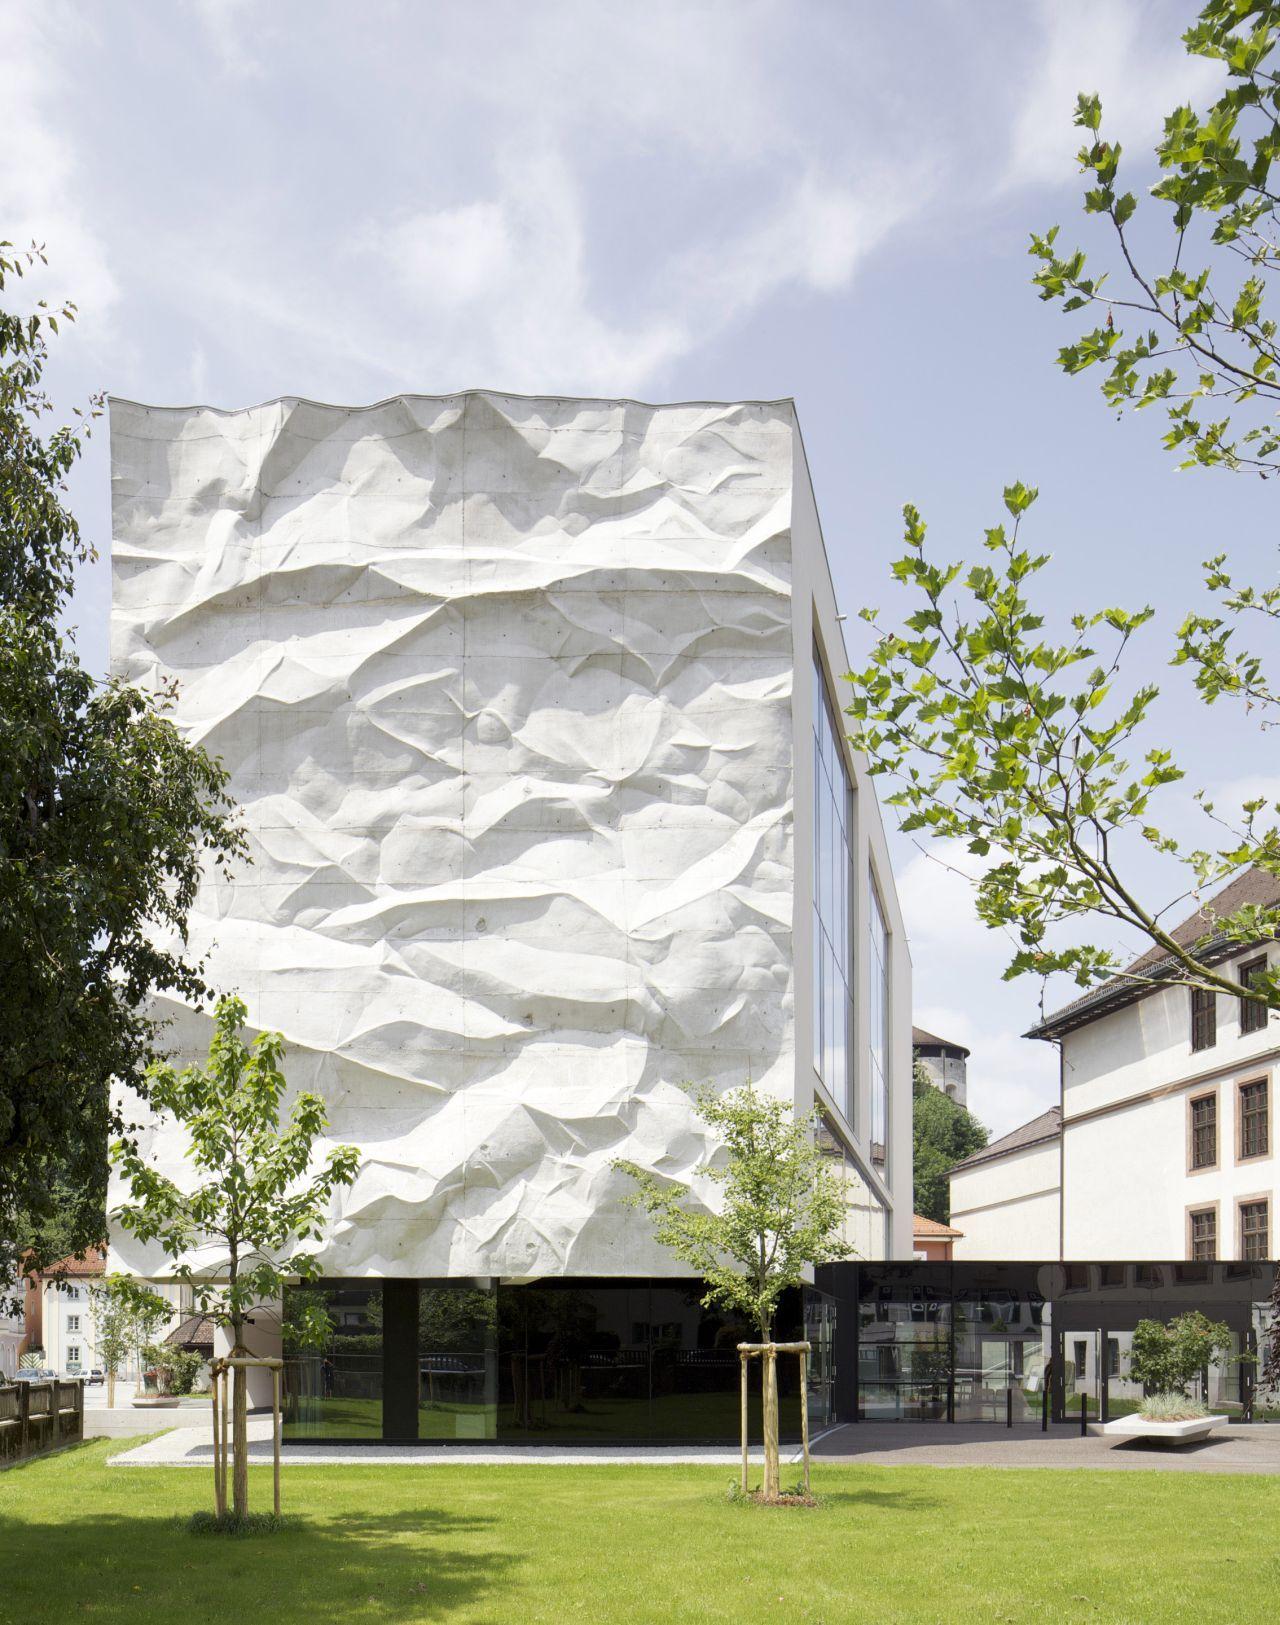 high school crinkled wall by wiesflecker architekten. Black Bedroom Furniture Sets. Home Design Ideas